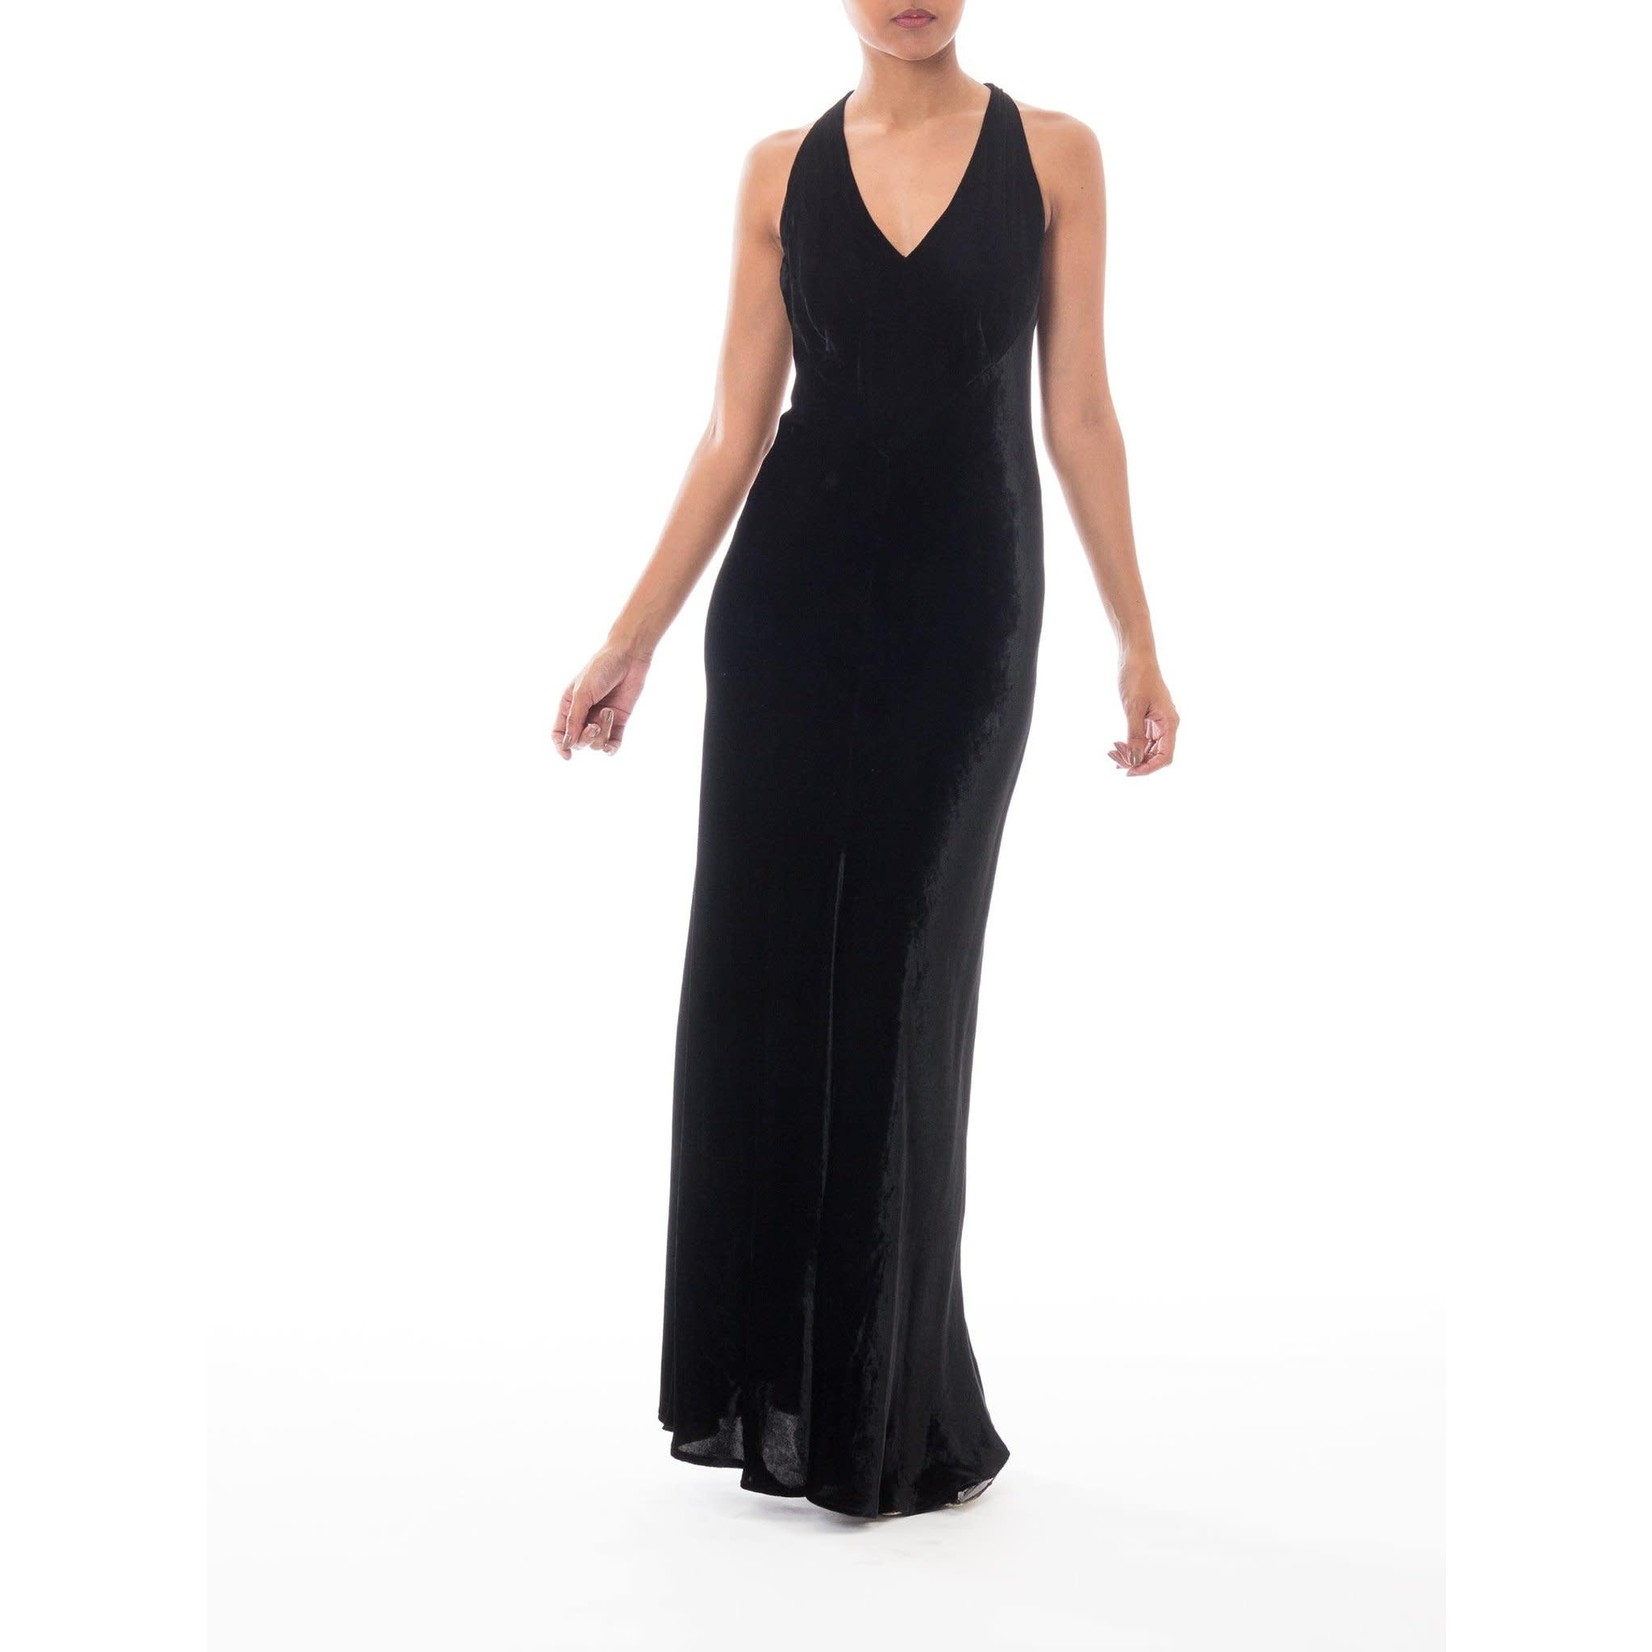 Morphew 1990s Donna Karan Black Bias Cut Rayon & Silk Velvet 1930s Backless Style Gown